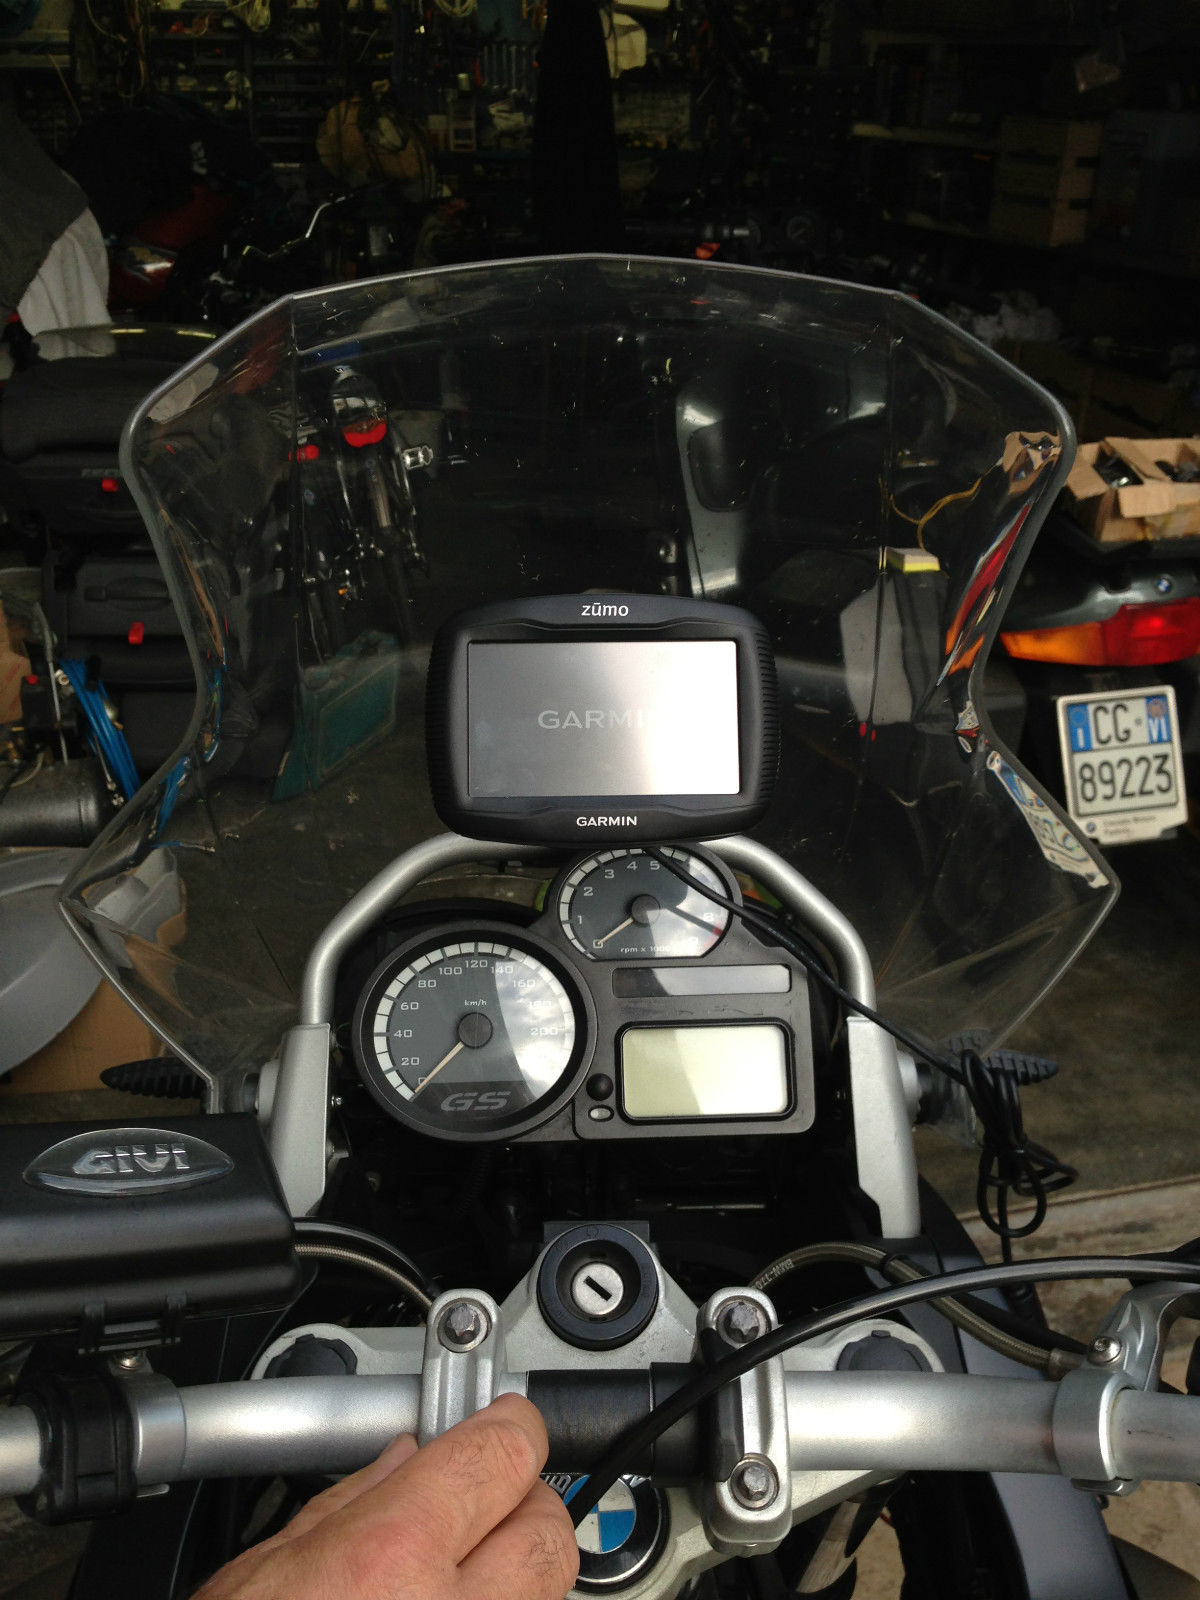 BMW R 1200 GS GPS/Smart phone houder2008-2012